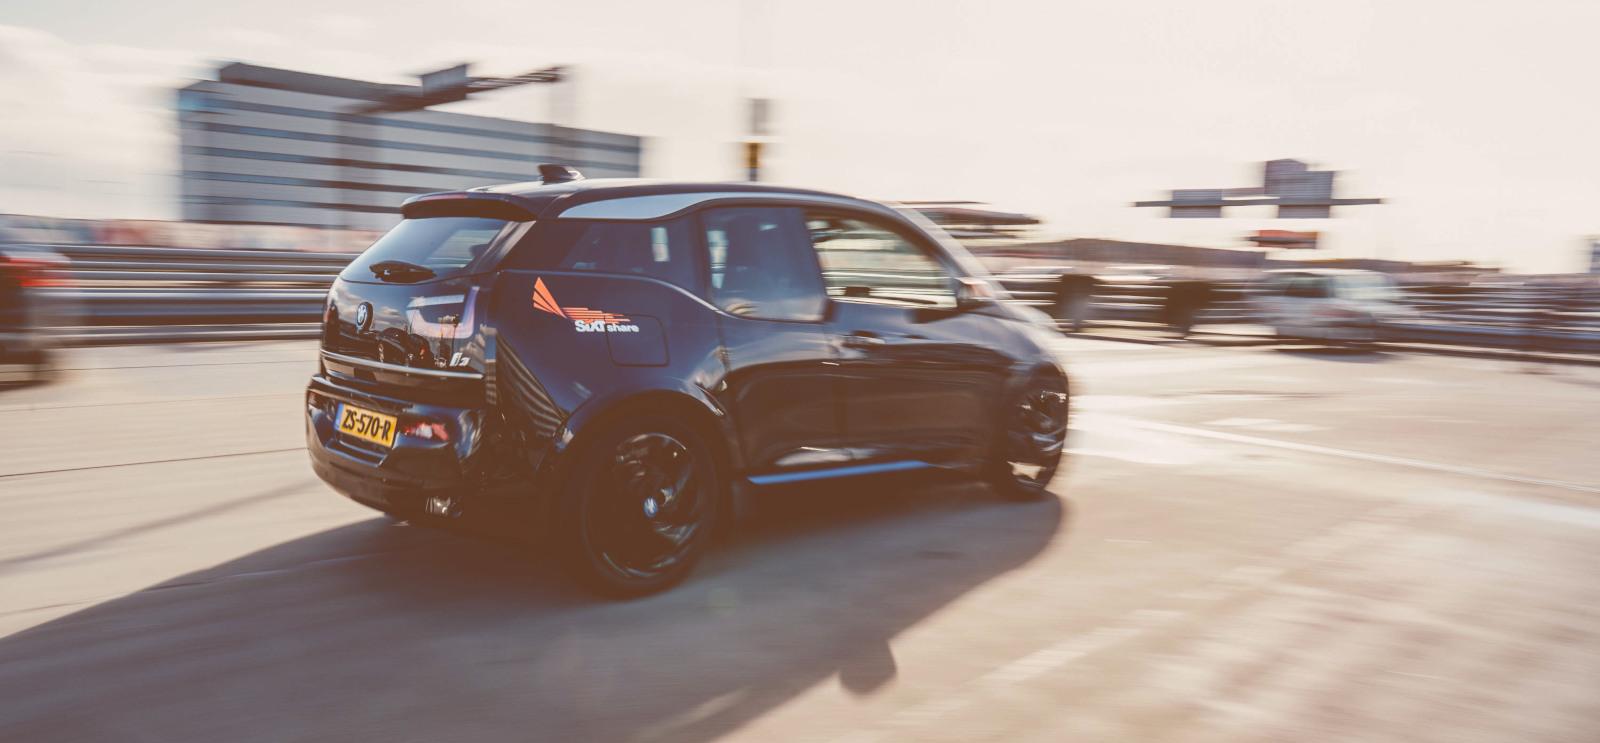 sixt share carsharing nederland 1